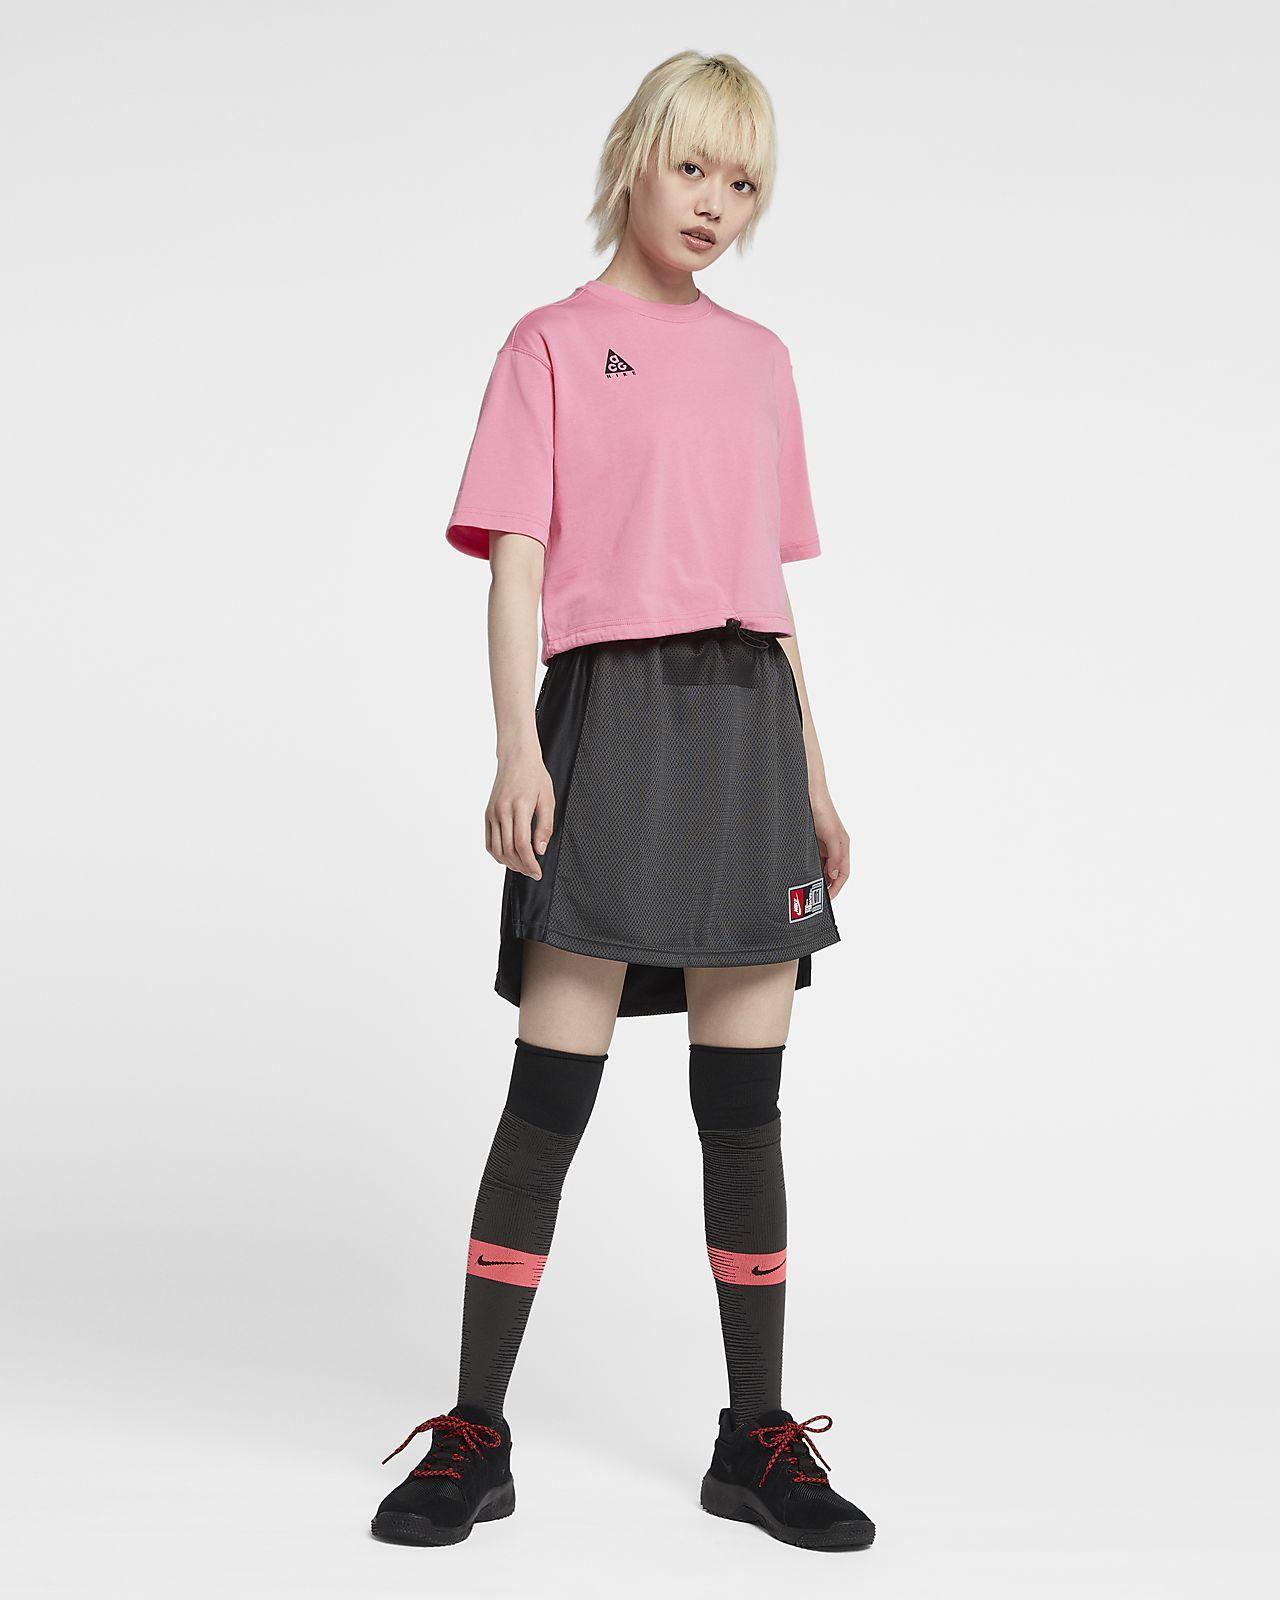 Jupe De Nikelab Football Collection FemmeFr Américain Pour drCxoWBe